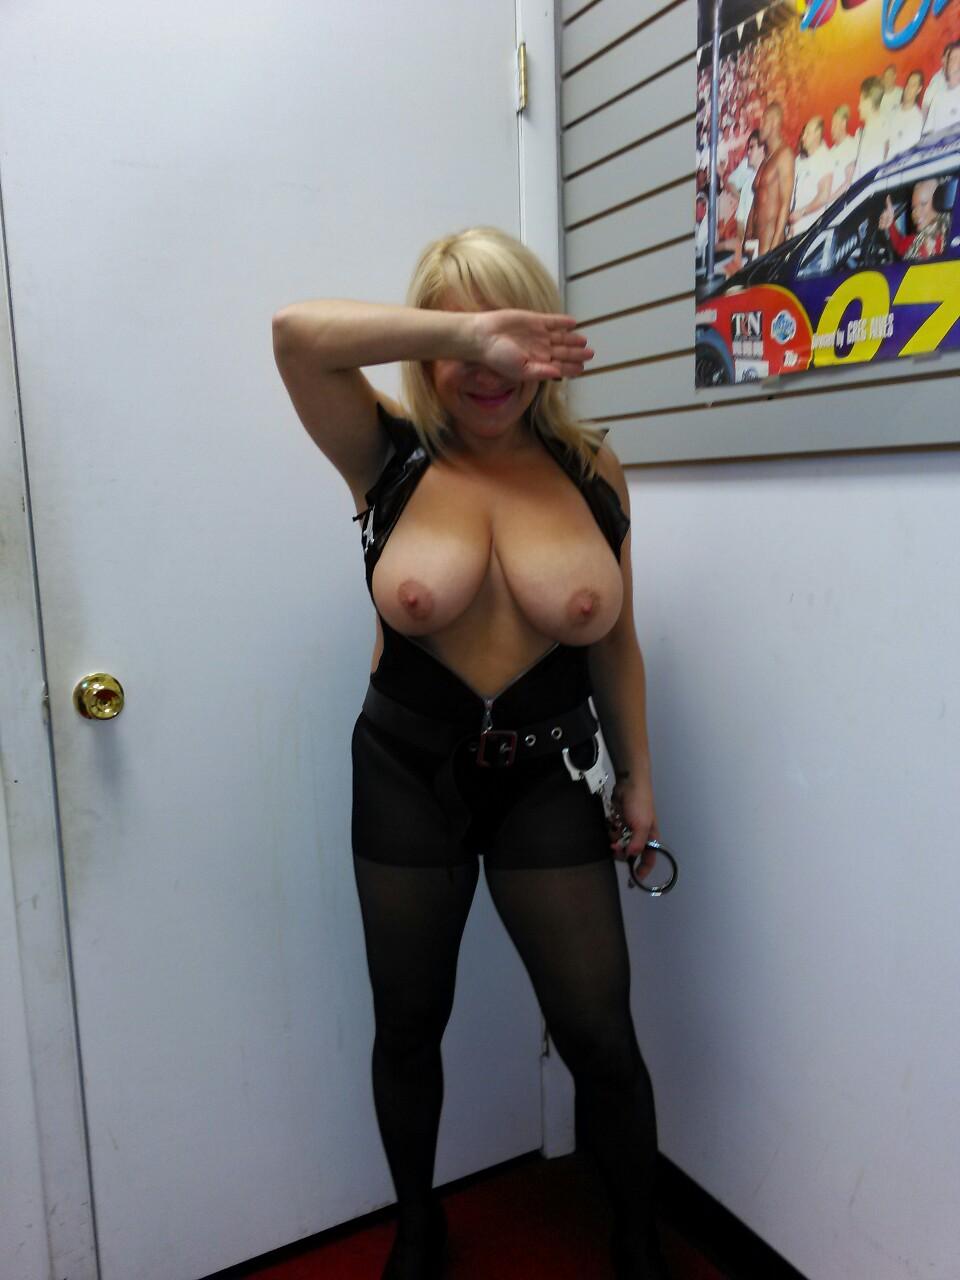 Horny Police 69